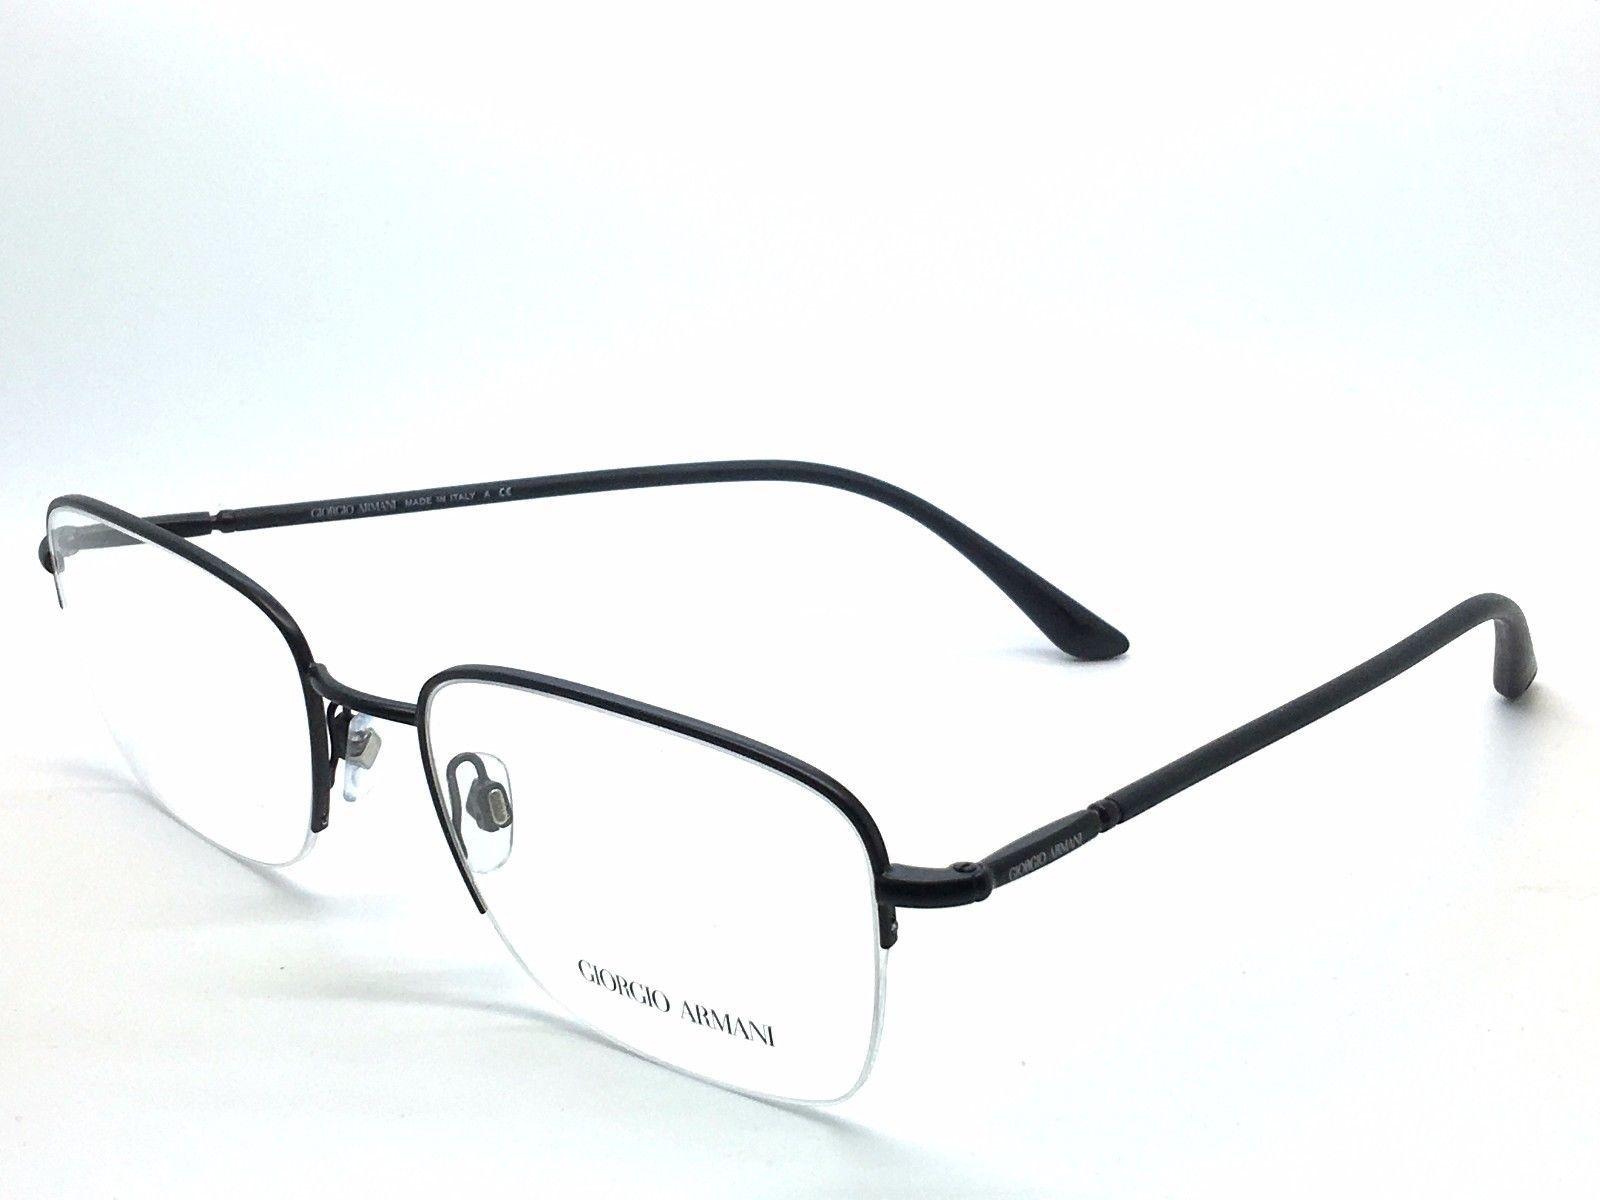 Giorgio Armani Frames: 2 listings